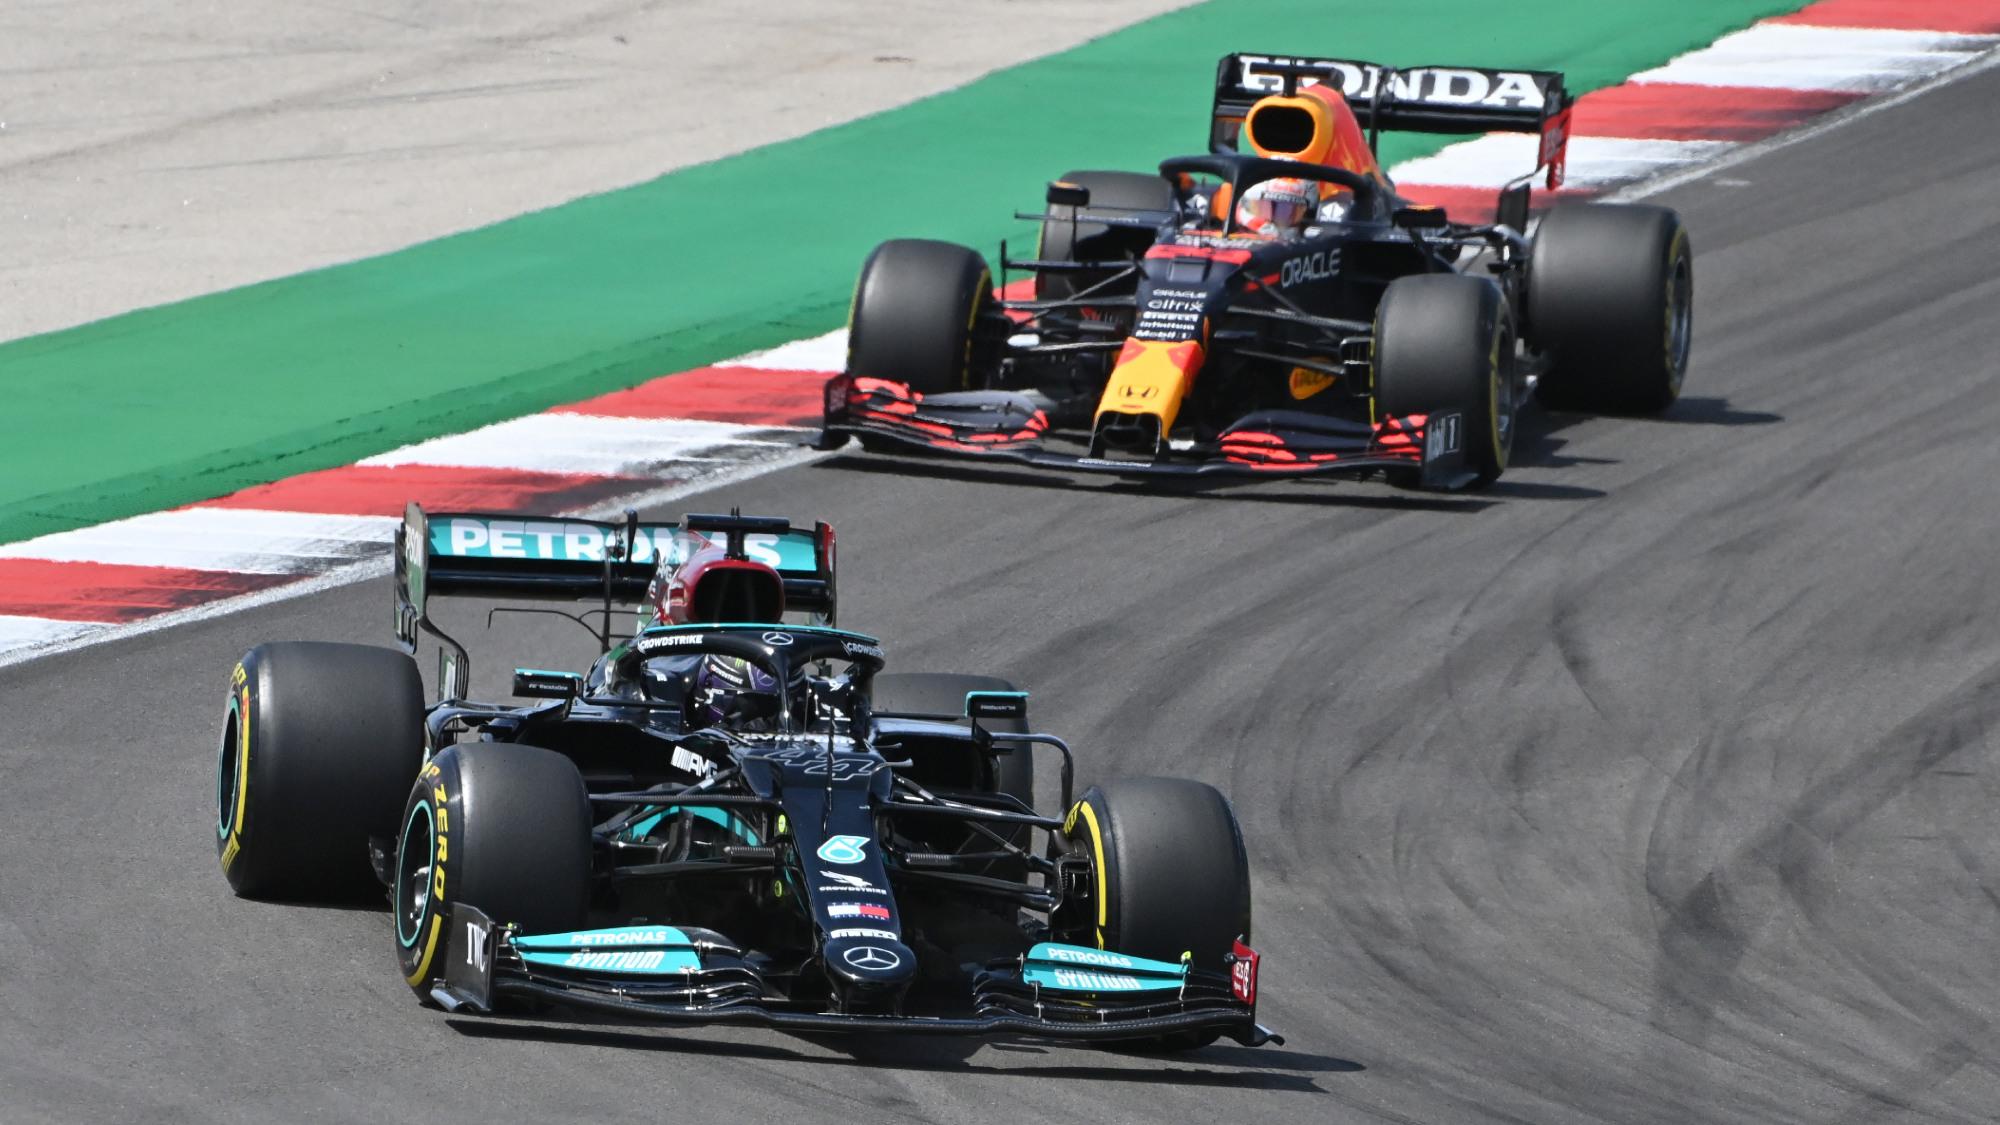 Lewis Hamilton, 2021 Portuguese GP